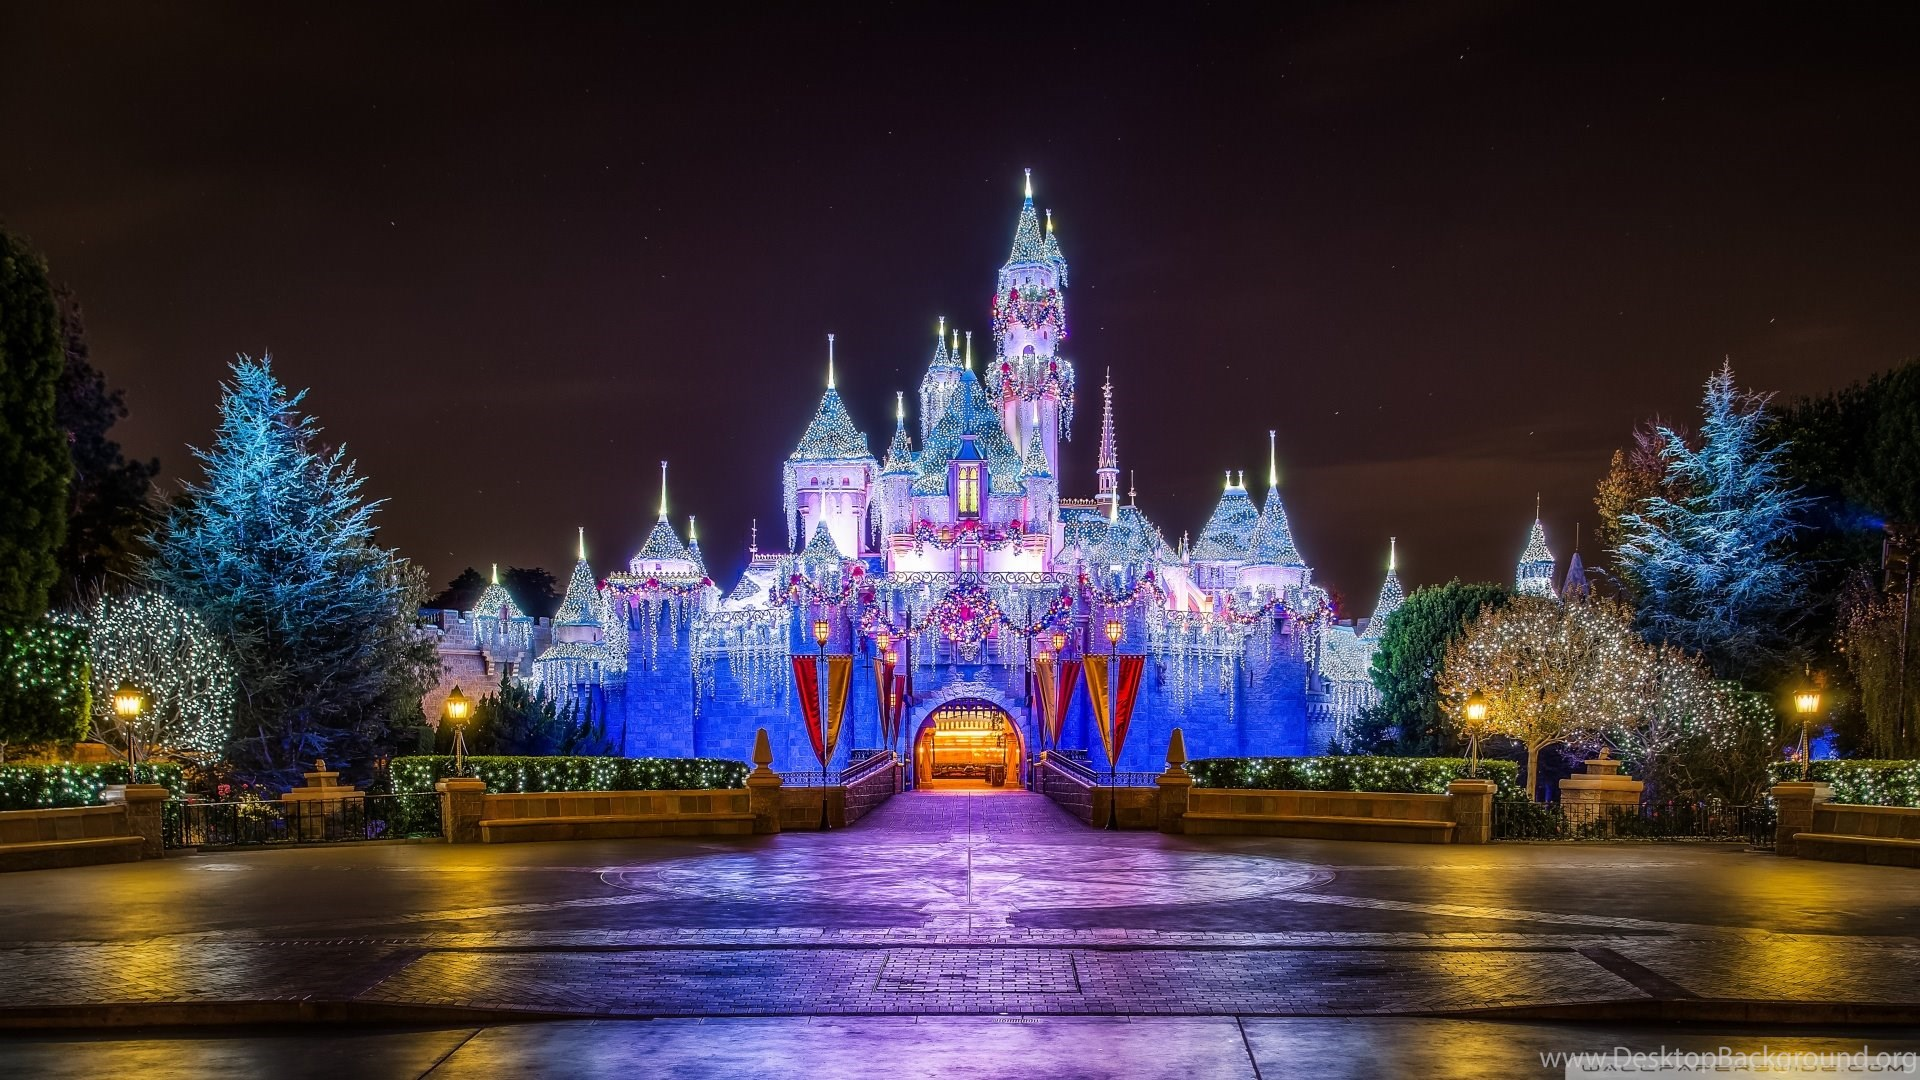 Disneyland Castle Christmas Wallpapers Desktop Background